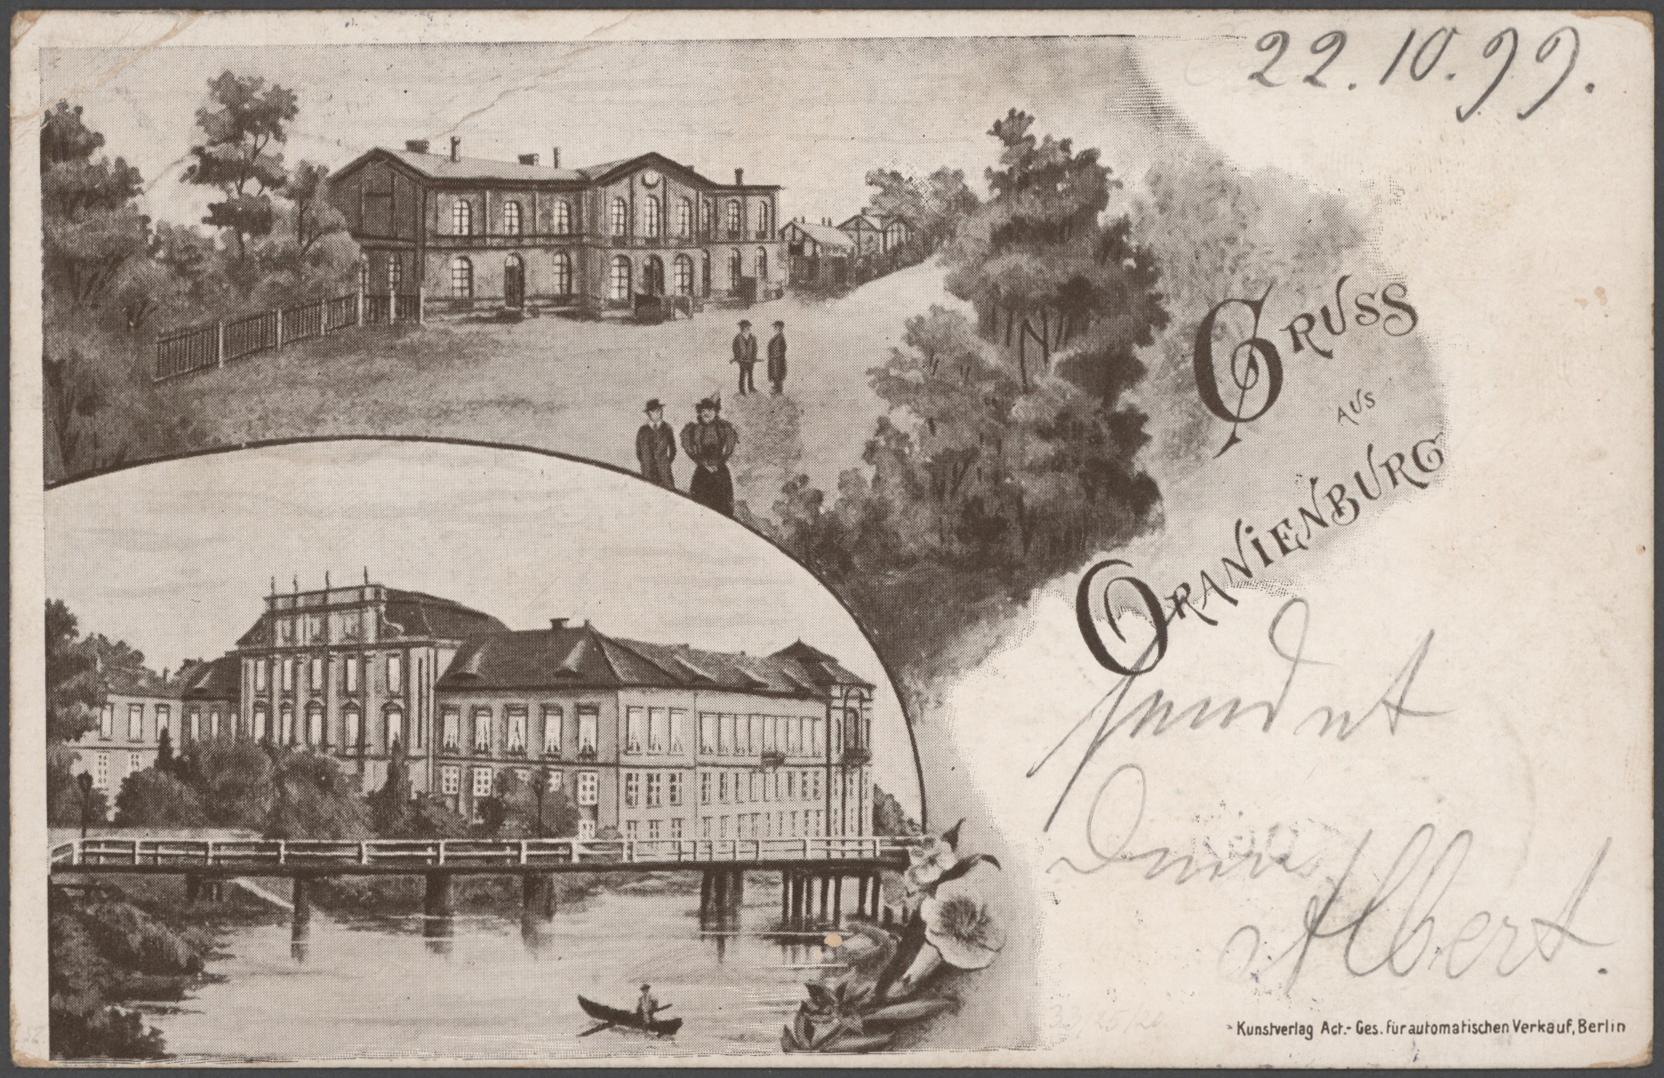 Lot 23535 - Deutsches Reich - Privatganzsachen  -  Auktionshaus Christoph Gärtner GmbH & Co. KG Sale #49 Collections Overseas, Thematics, Europe, Germany/Estates